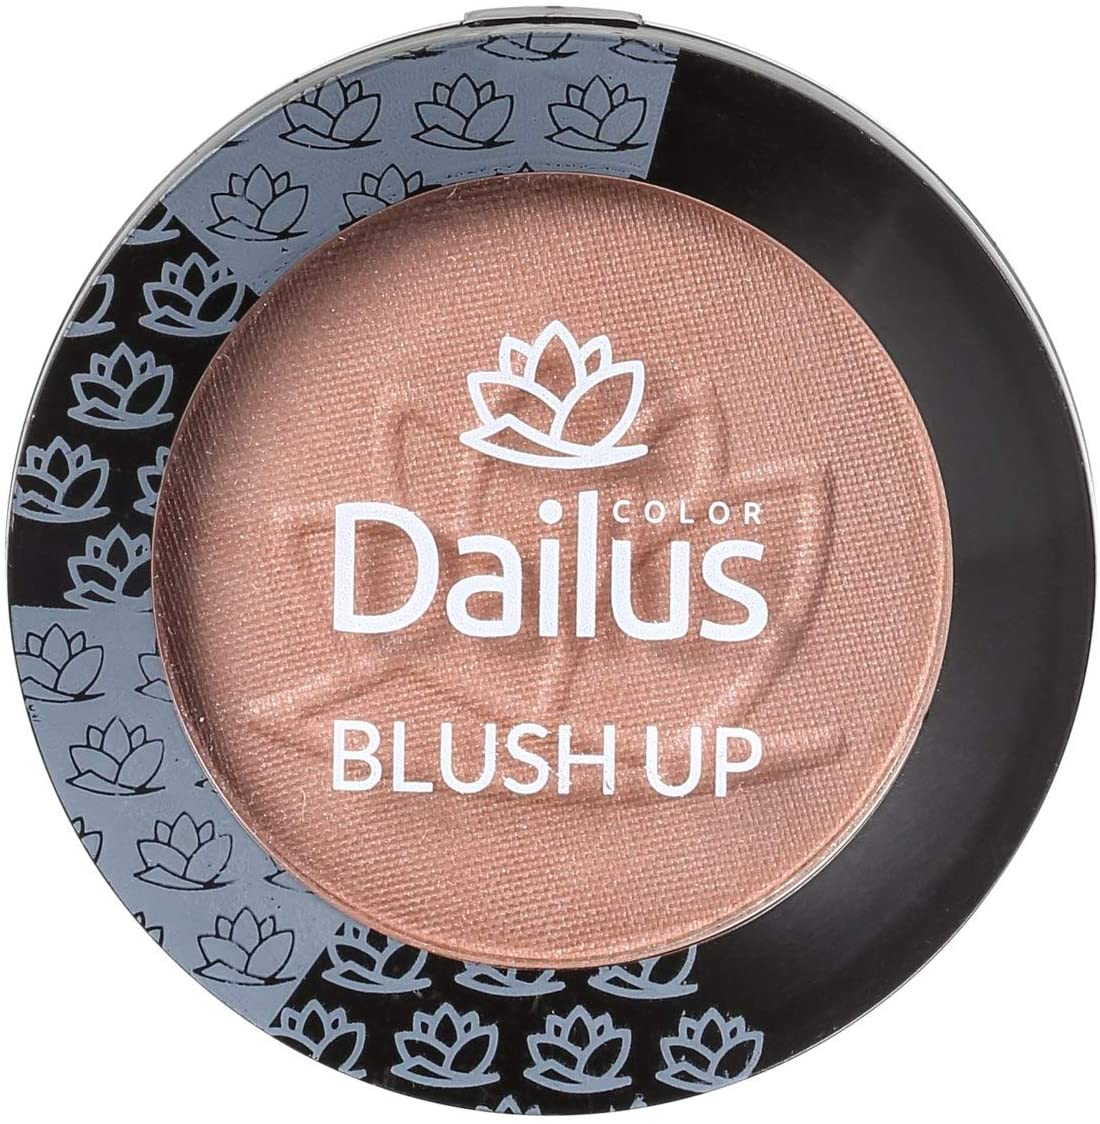 Blush Up Nude 14 Dailus